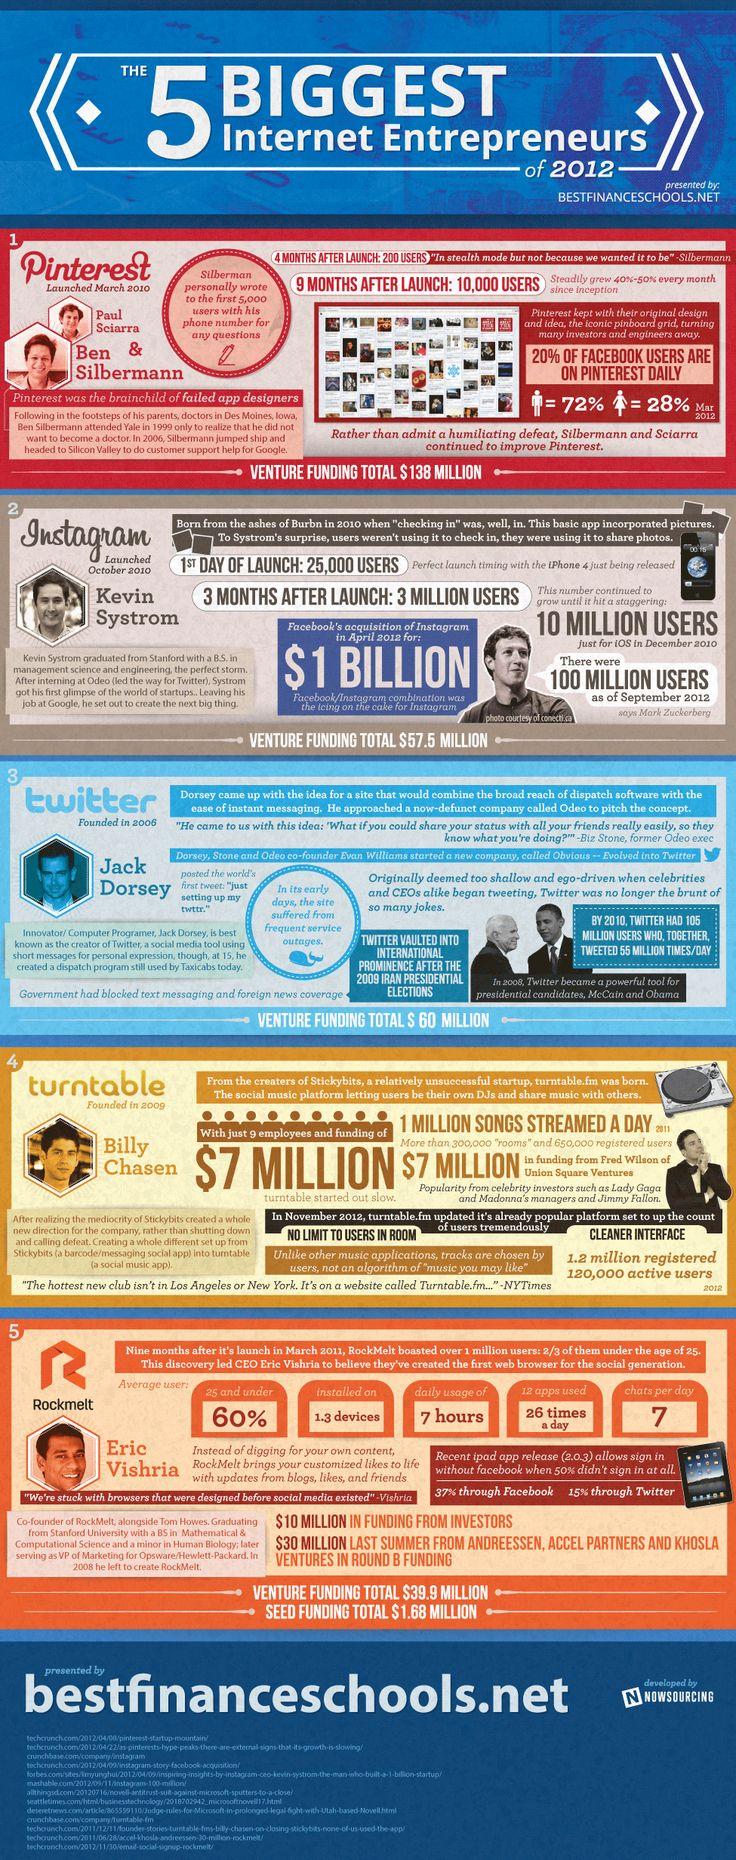 The 5 biggest Internet entrepreneurs of 2012 #infographic